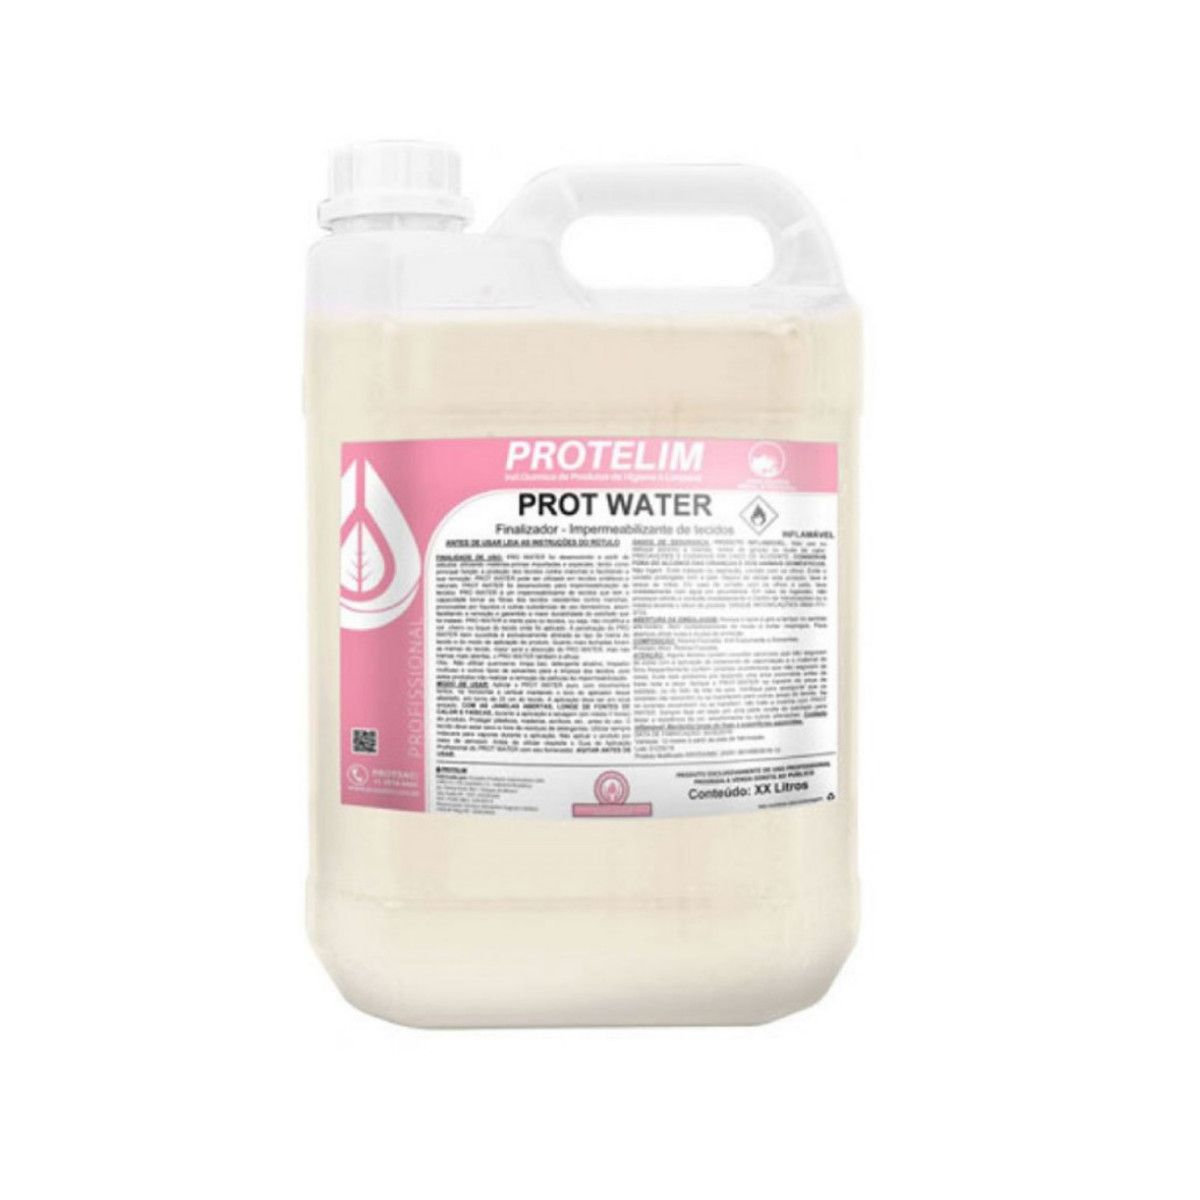 Kit Impermeabilizante De Tecidos Sofá Estofados Prot Water Prot Carp20 Protelim